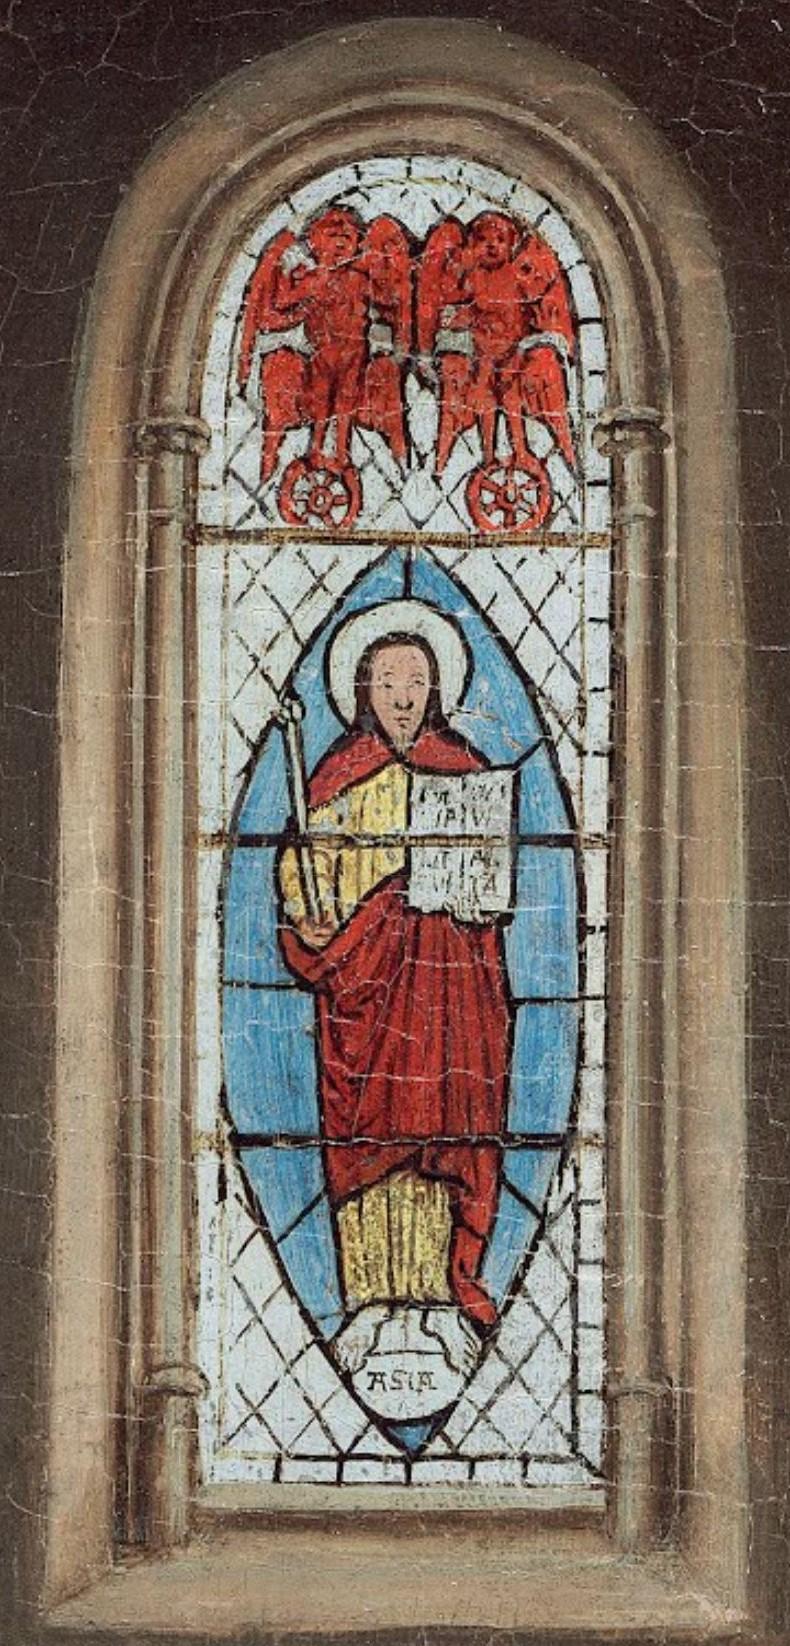 Van Eyck Annonciation 1434-36 NGA vitrail seul